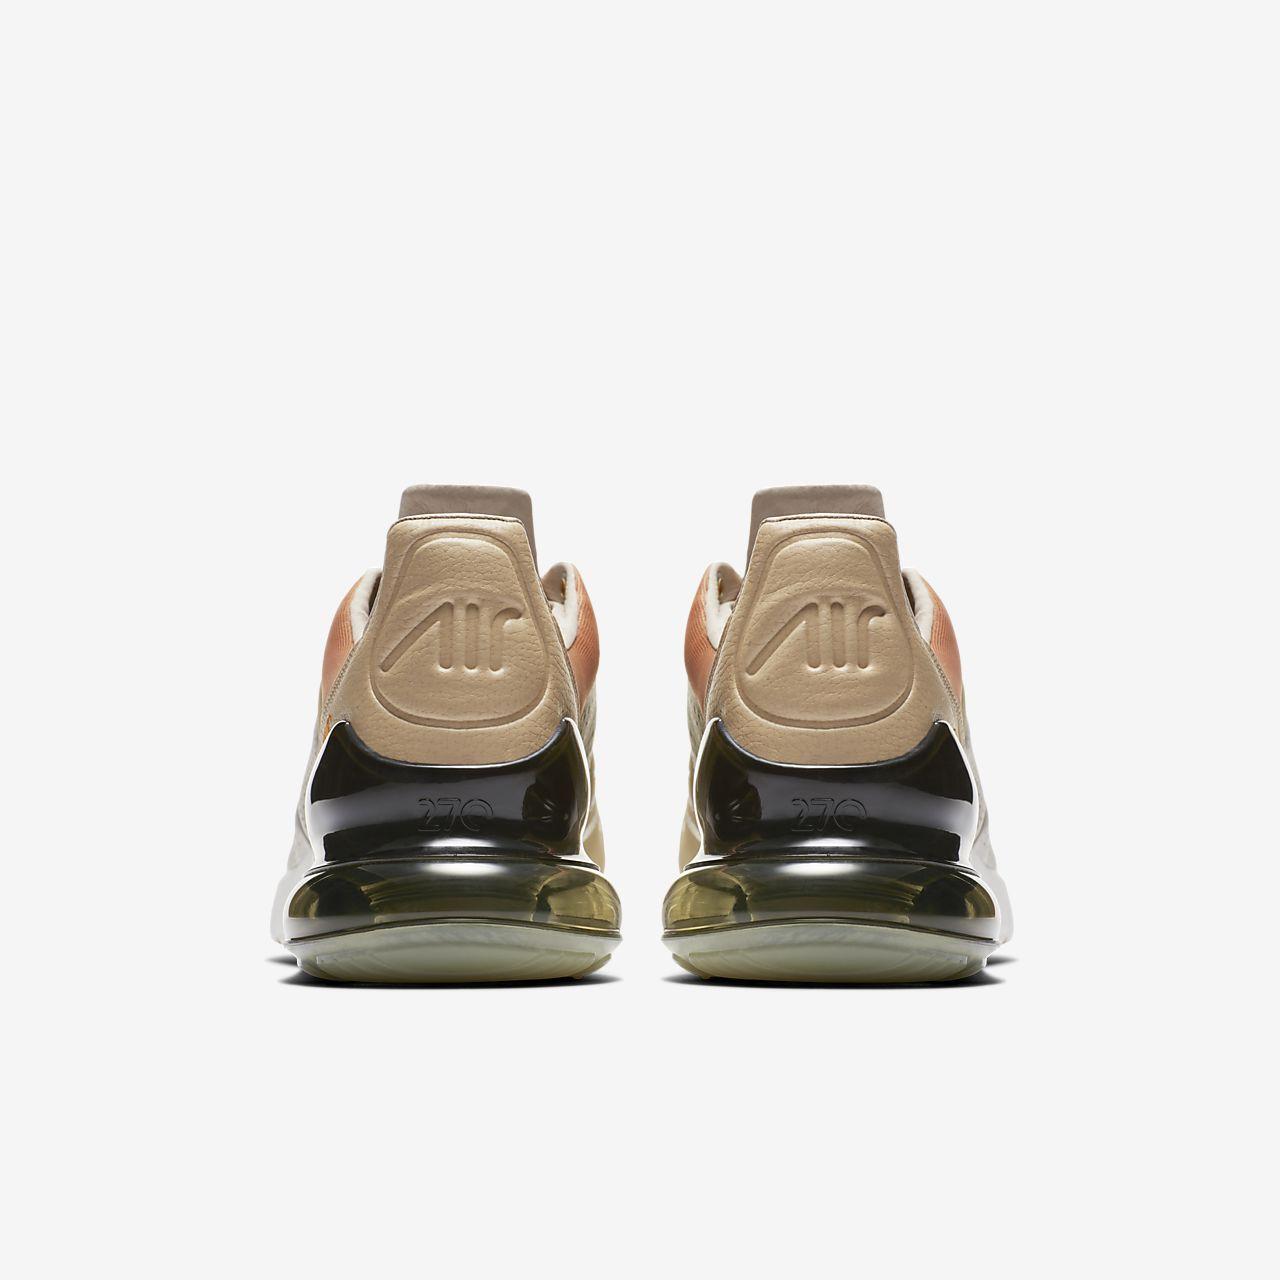 new arrivals e8bfb 69e22 ... Nike Air Max 270 Premium Men s Shoe